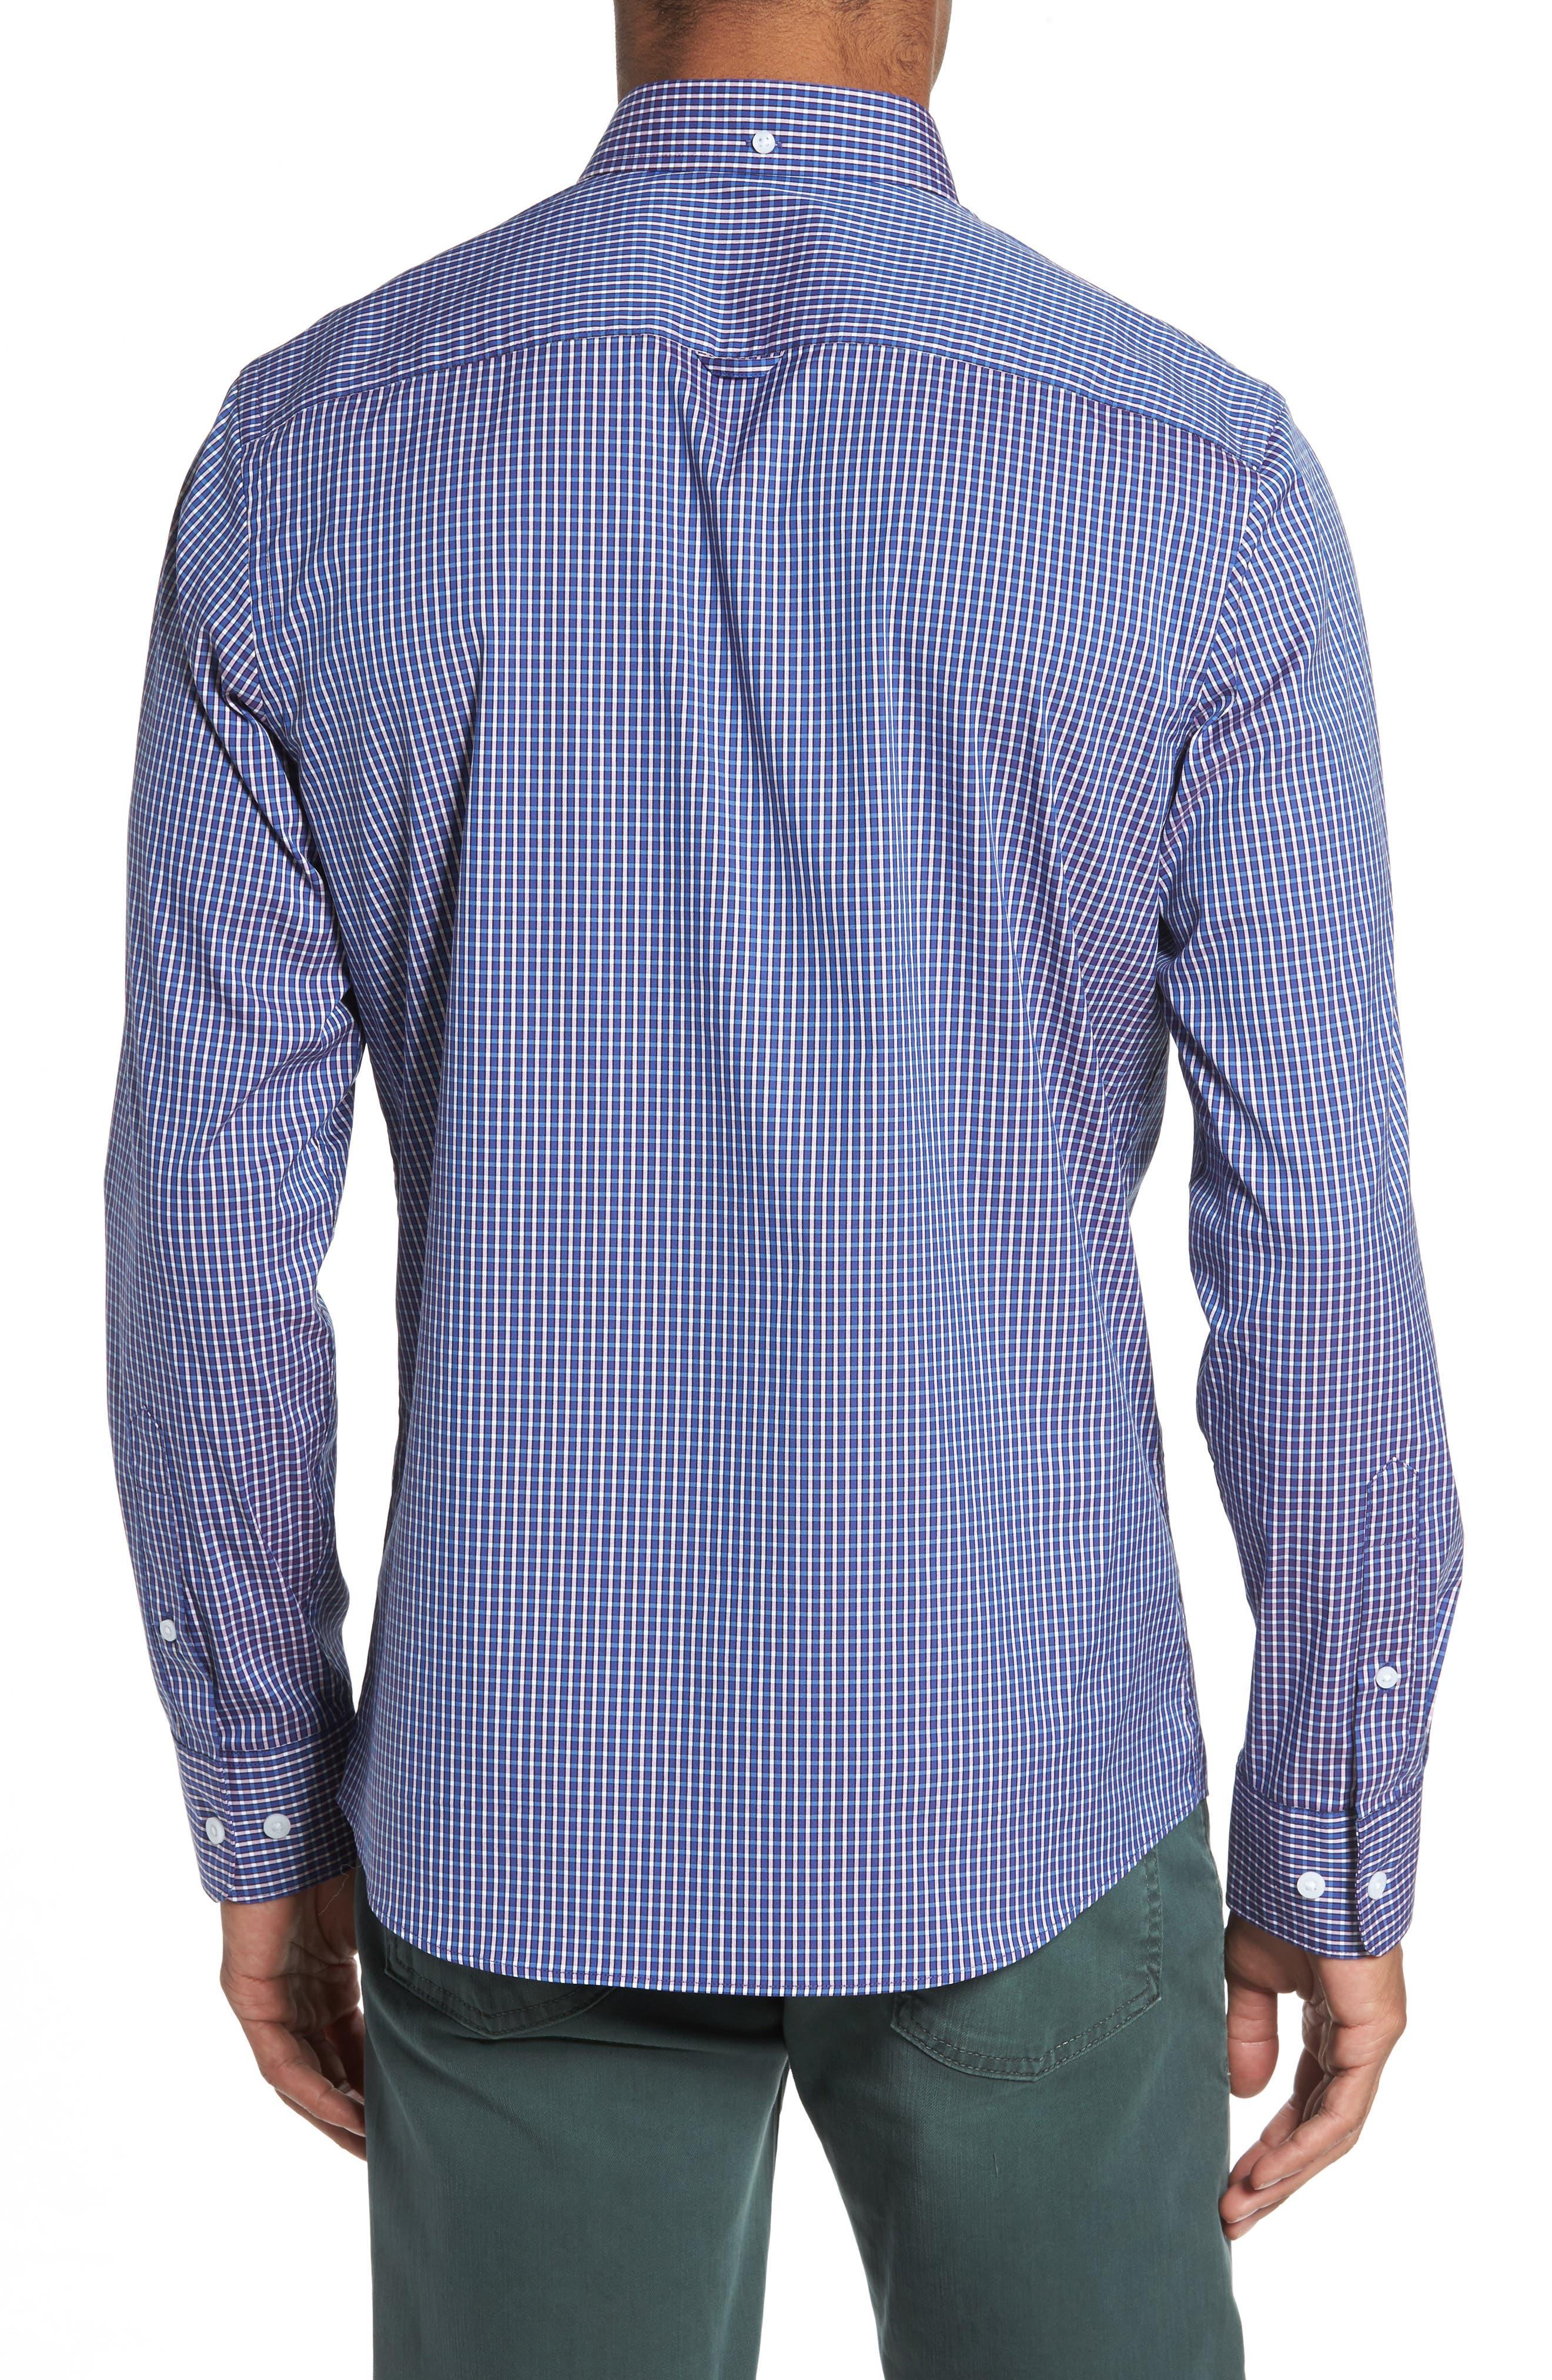 Alternate Image 2  - Nordstrom Men's Shop Tech-Smart Trim Fit Check Sport Shirt